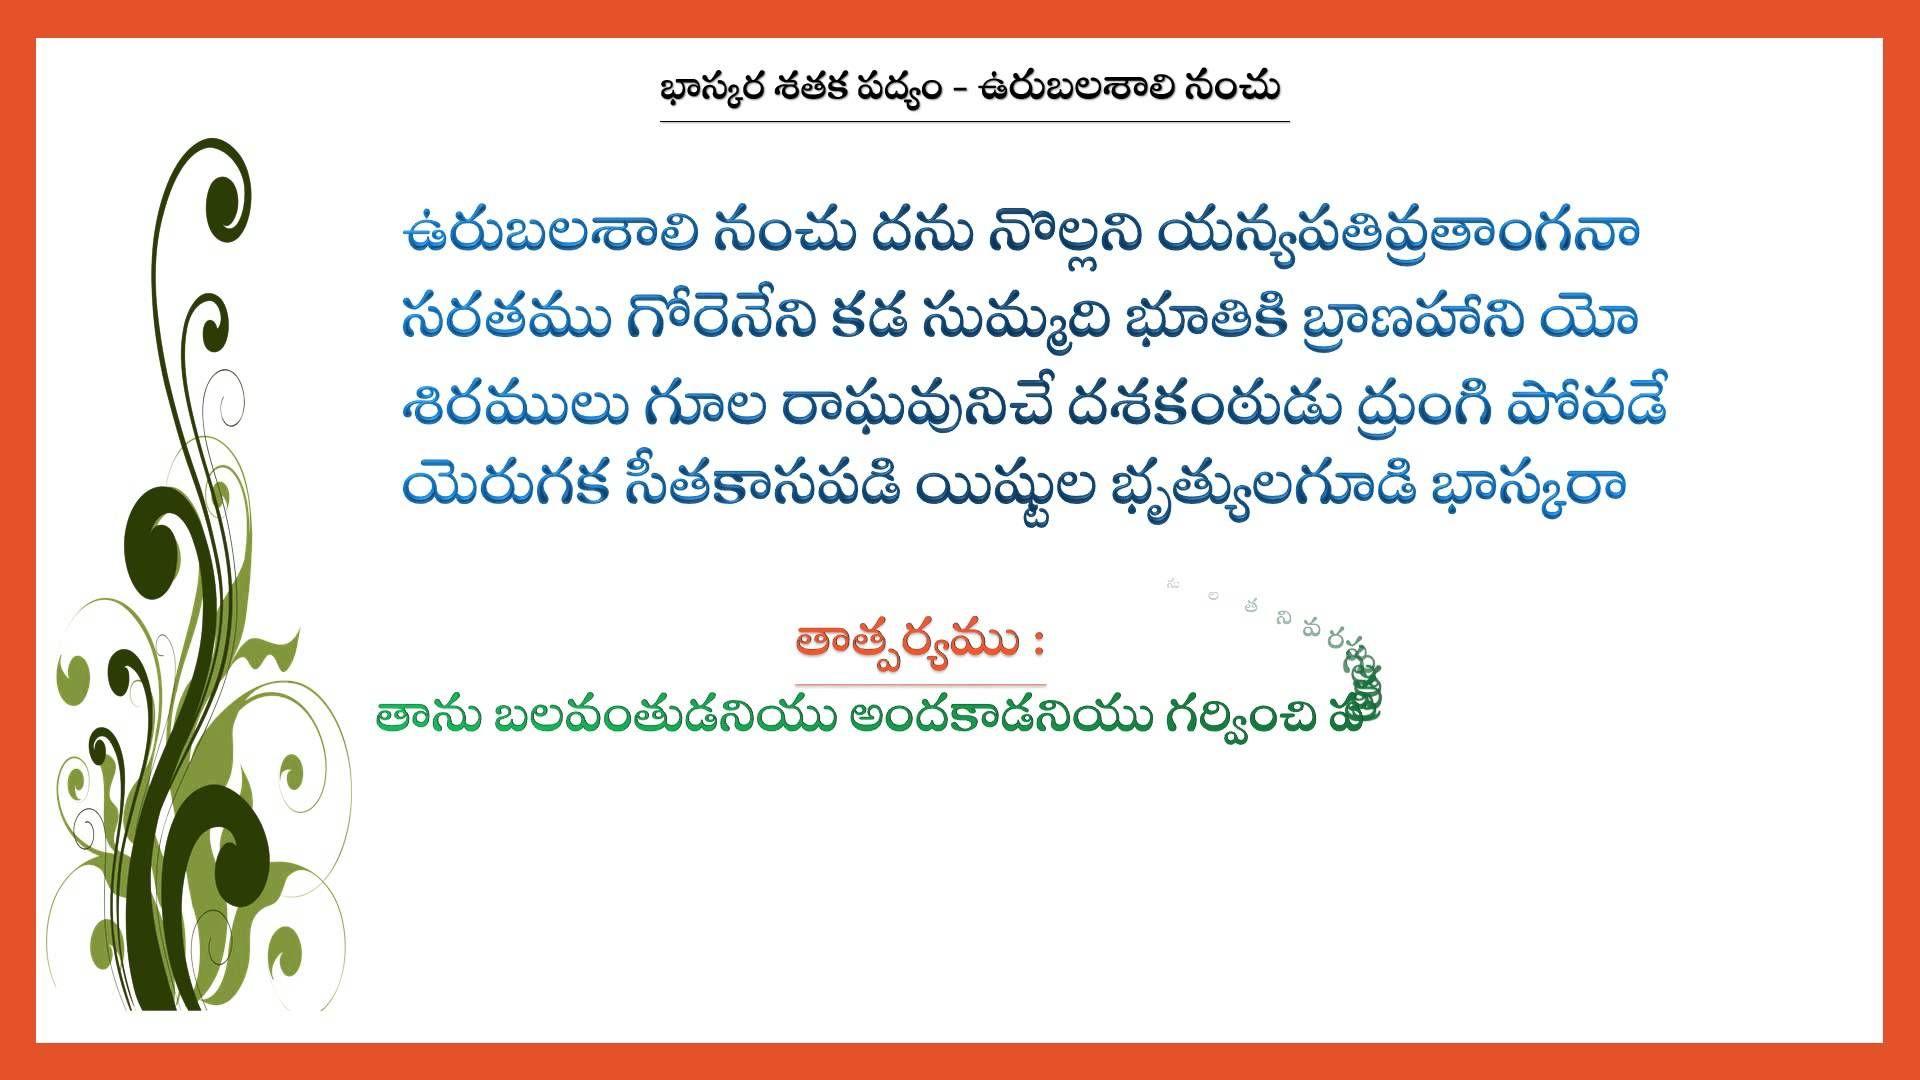 Teta Telugu - Bhaskara Shataka Padyam - Urubalashaali Nanchu